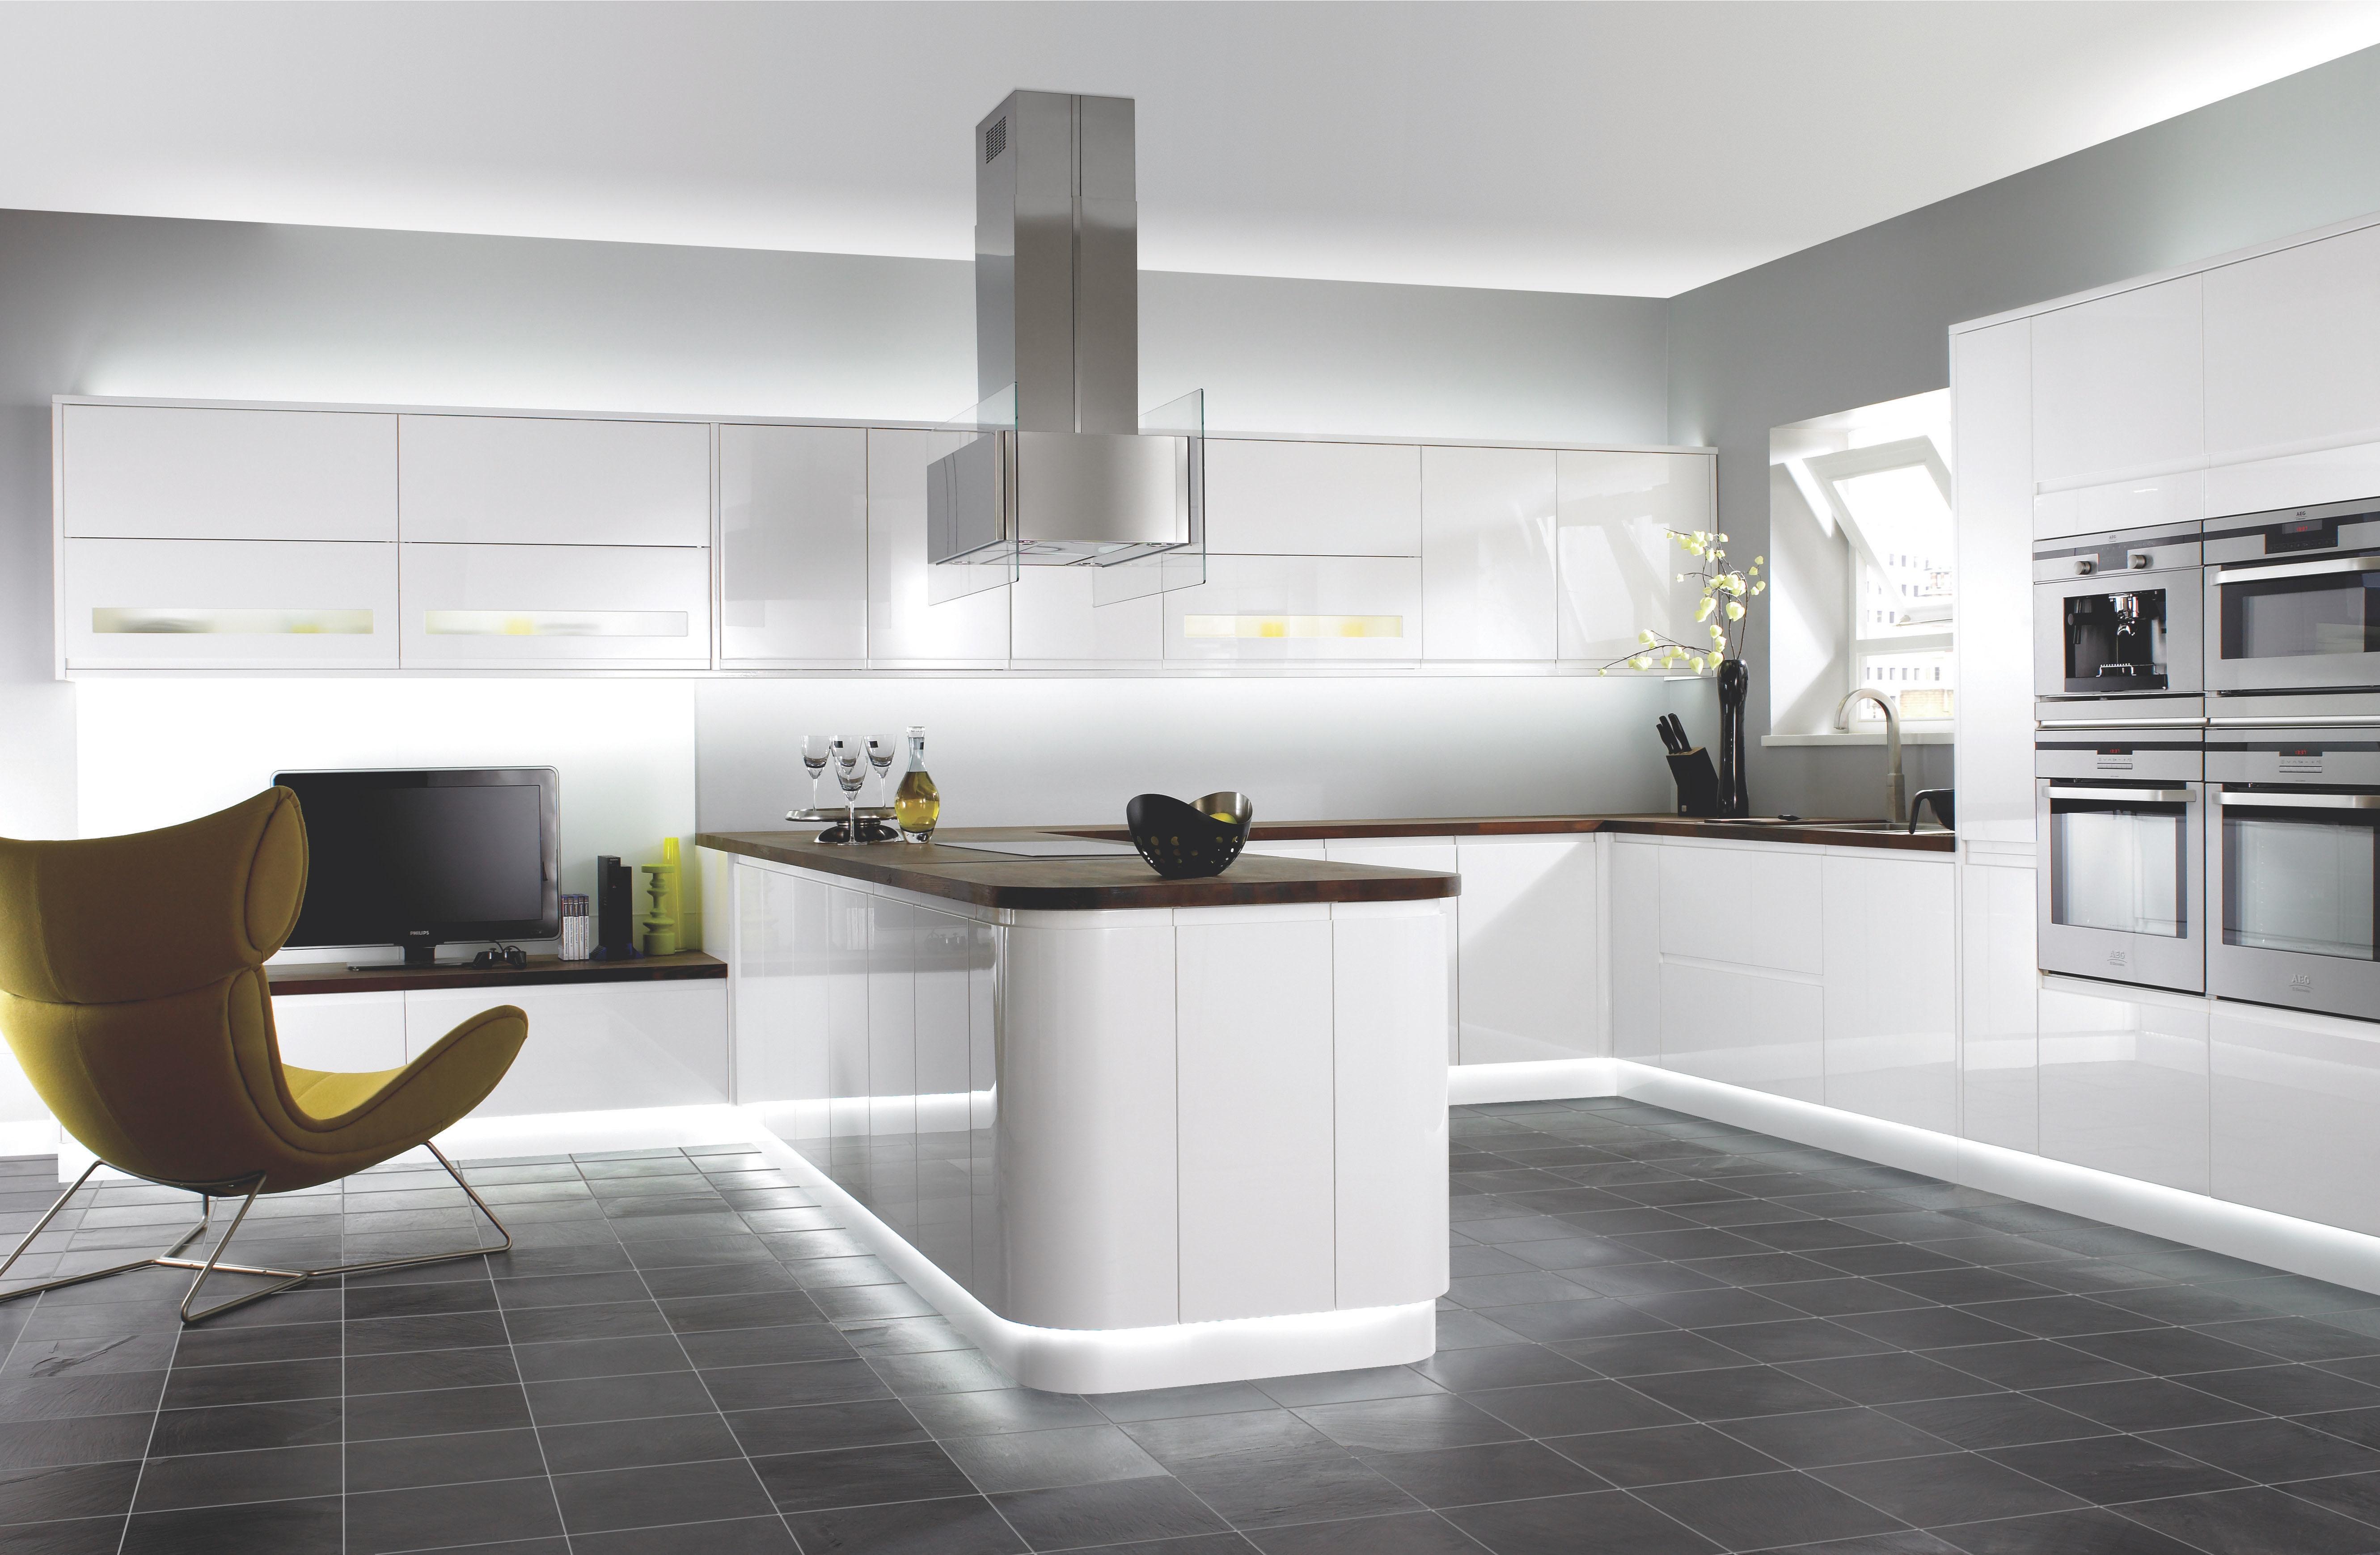 Wallpaper Interior Design Style Home Room Kitchen 5323x3478